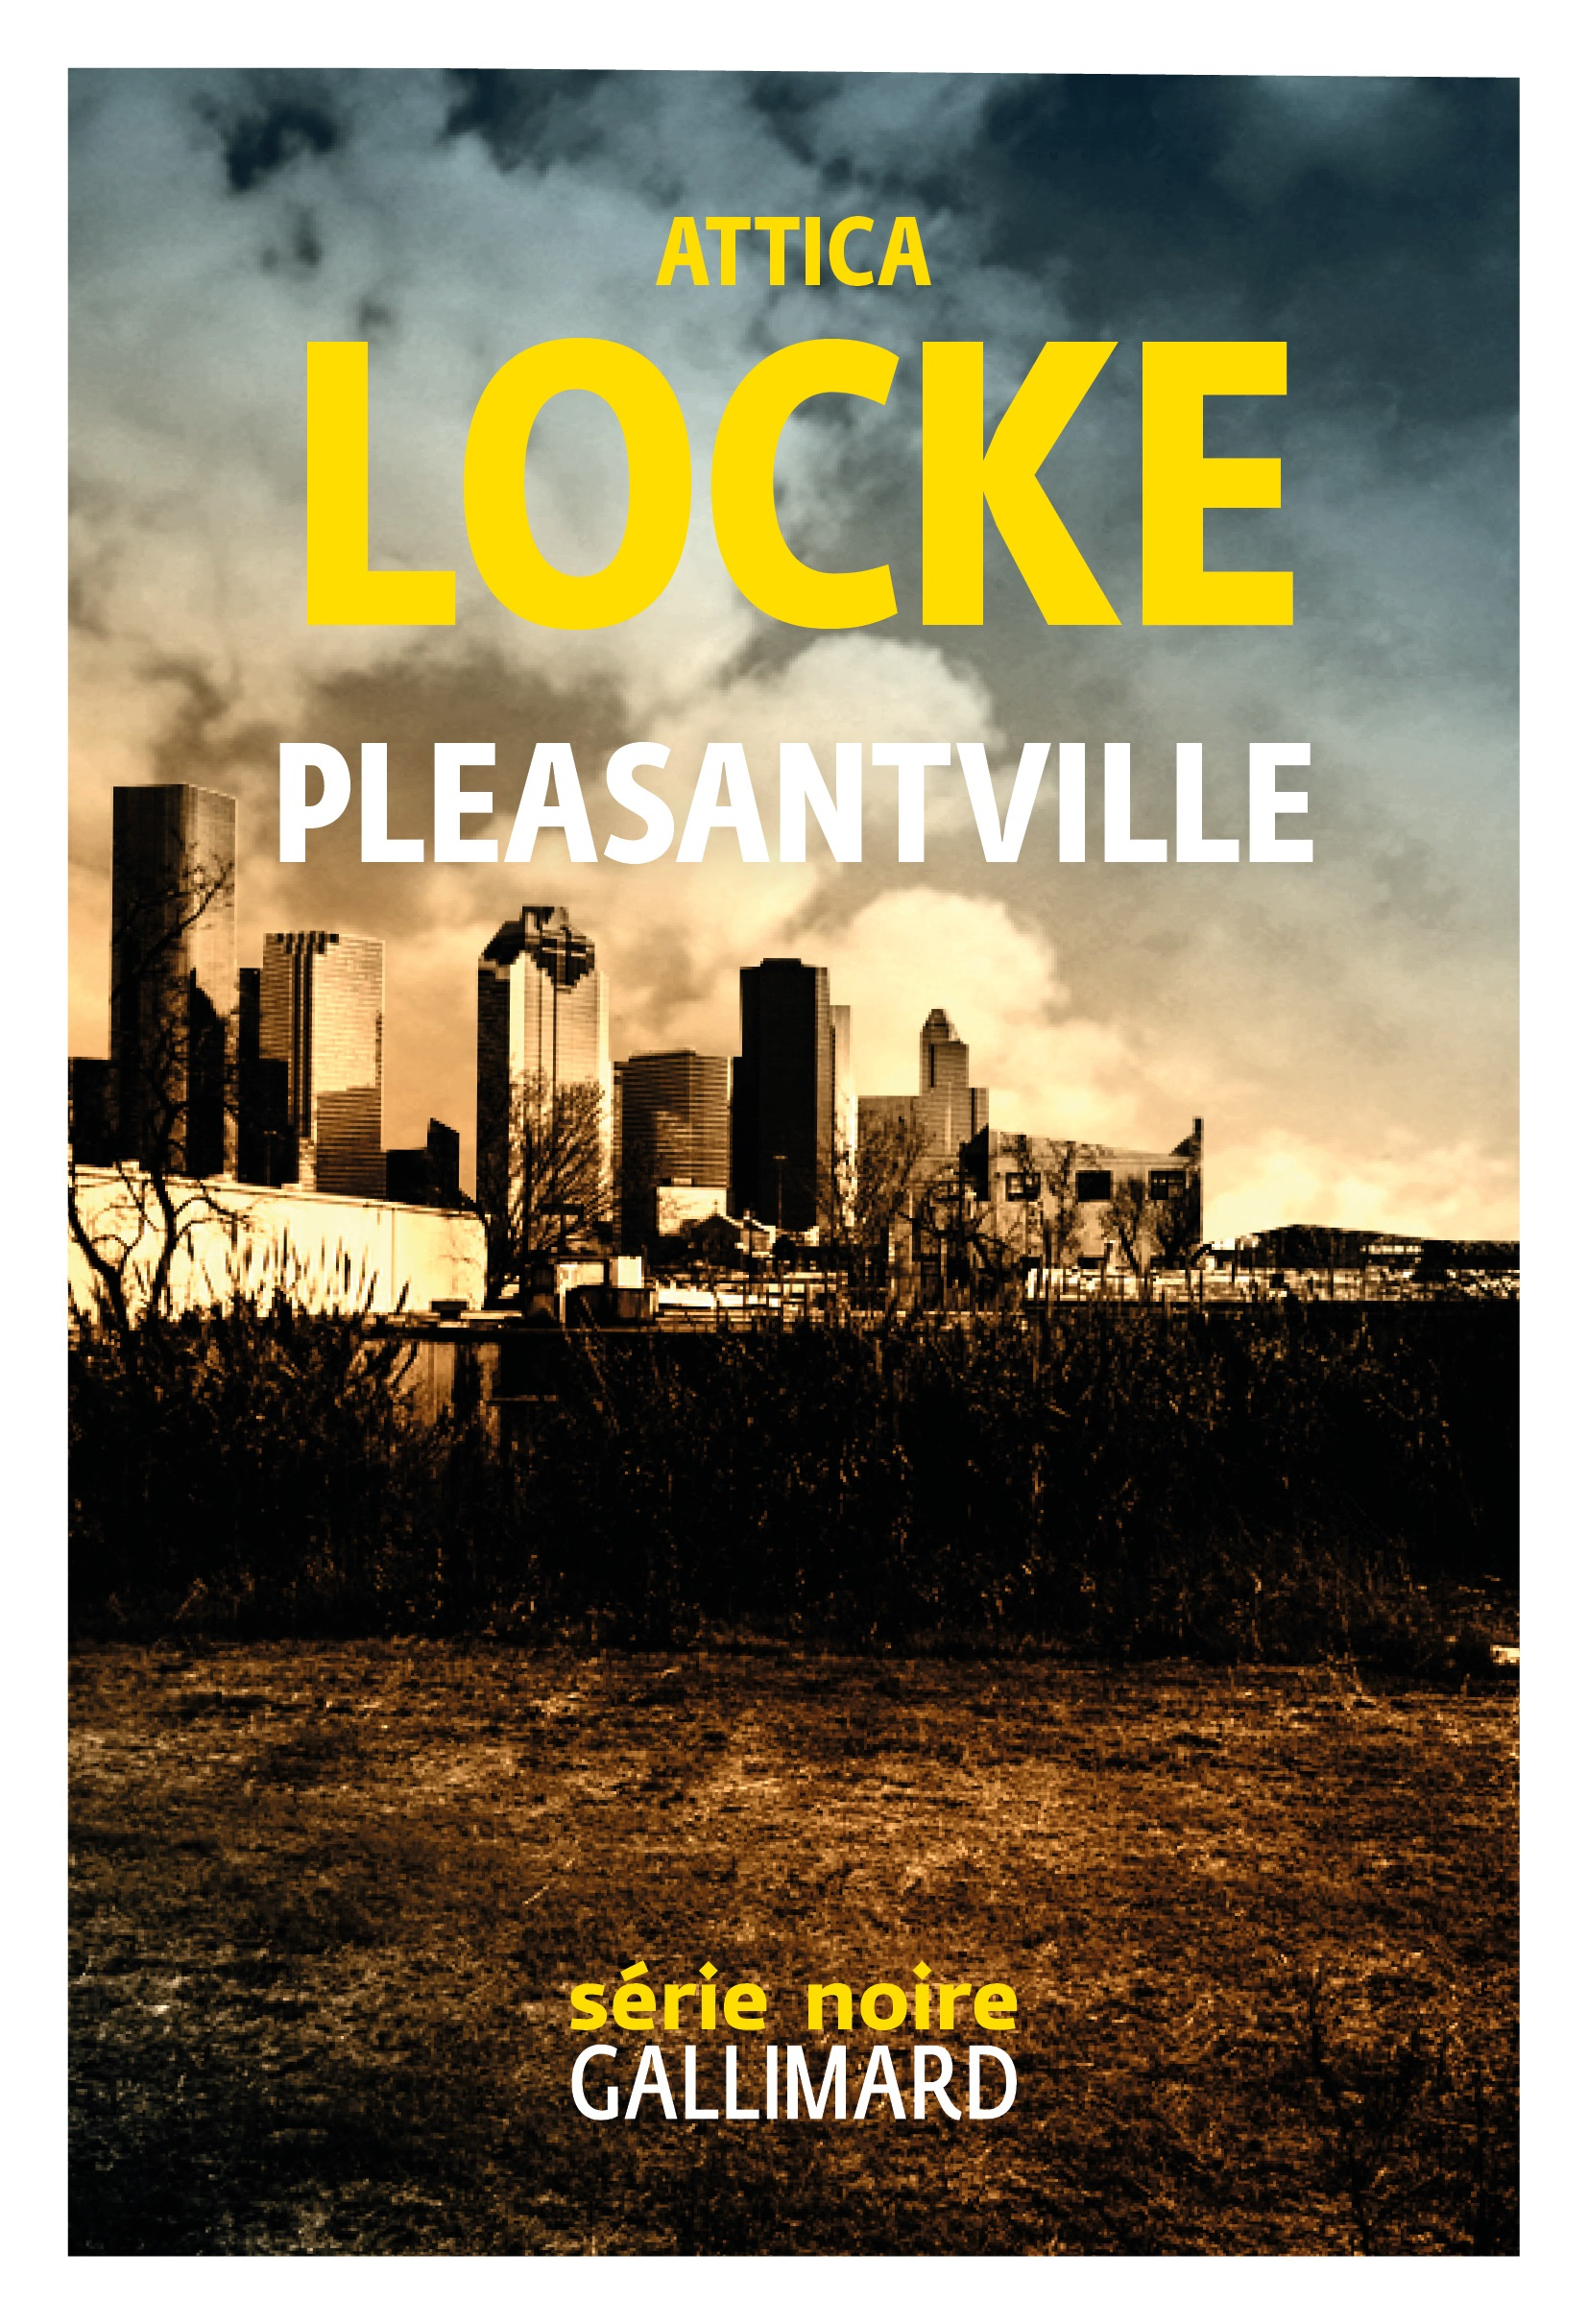 Pleasantville | Locke, Attica